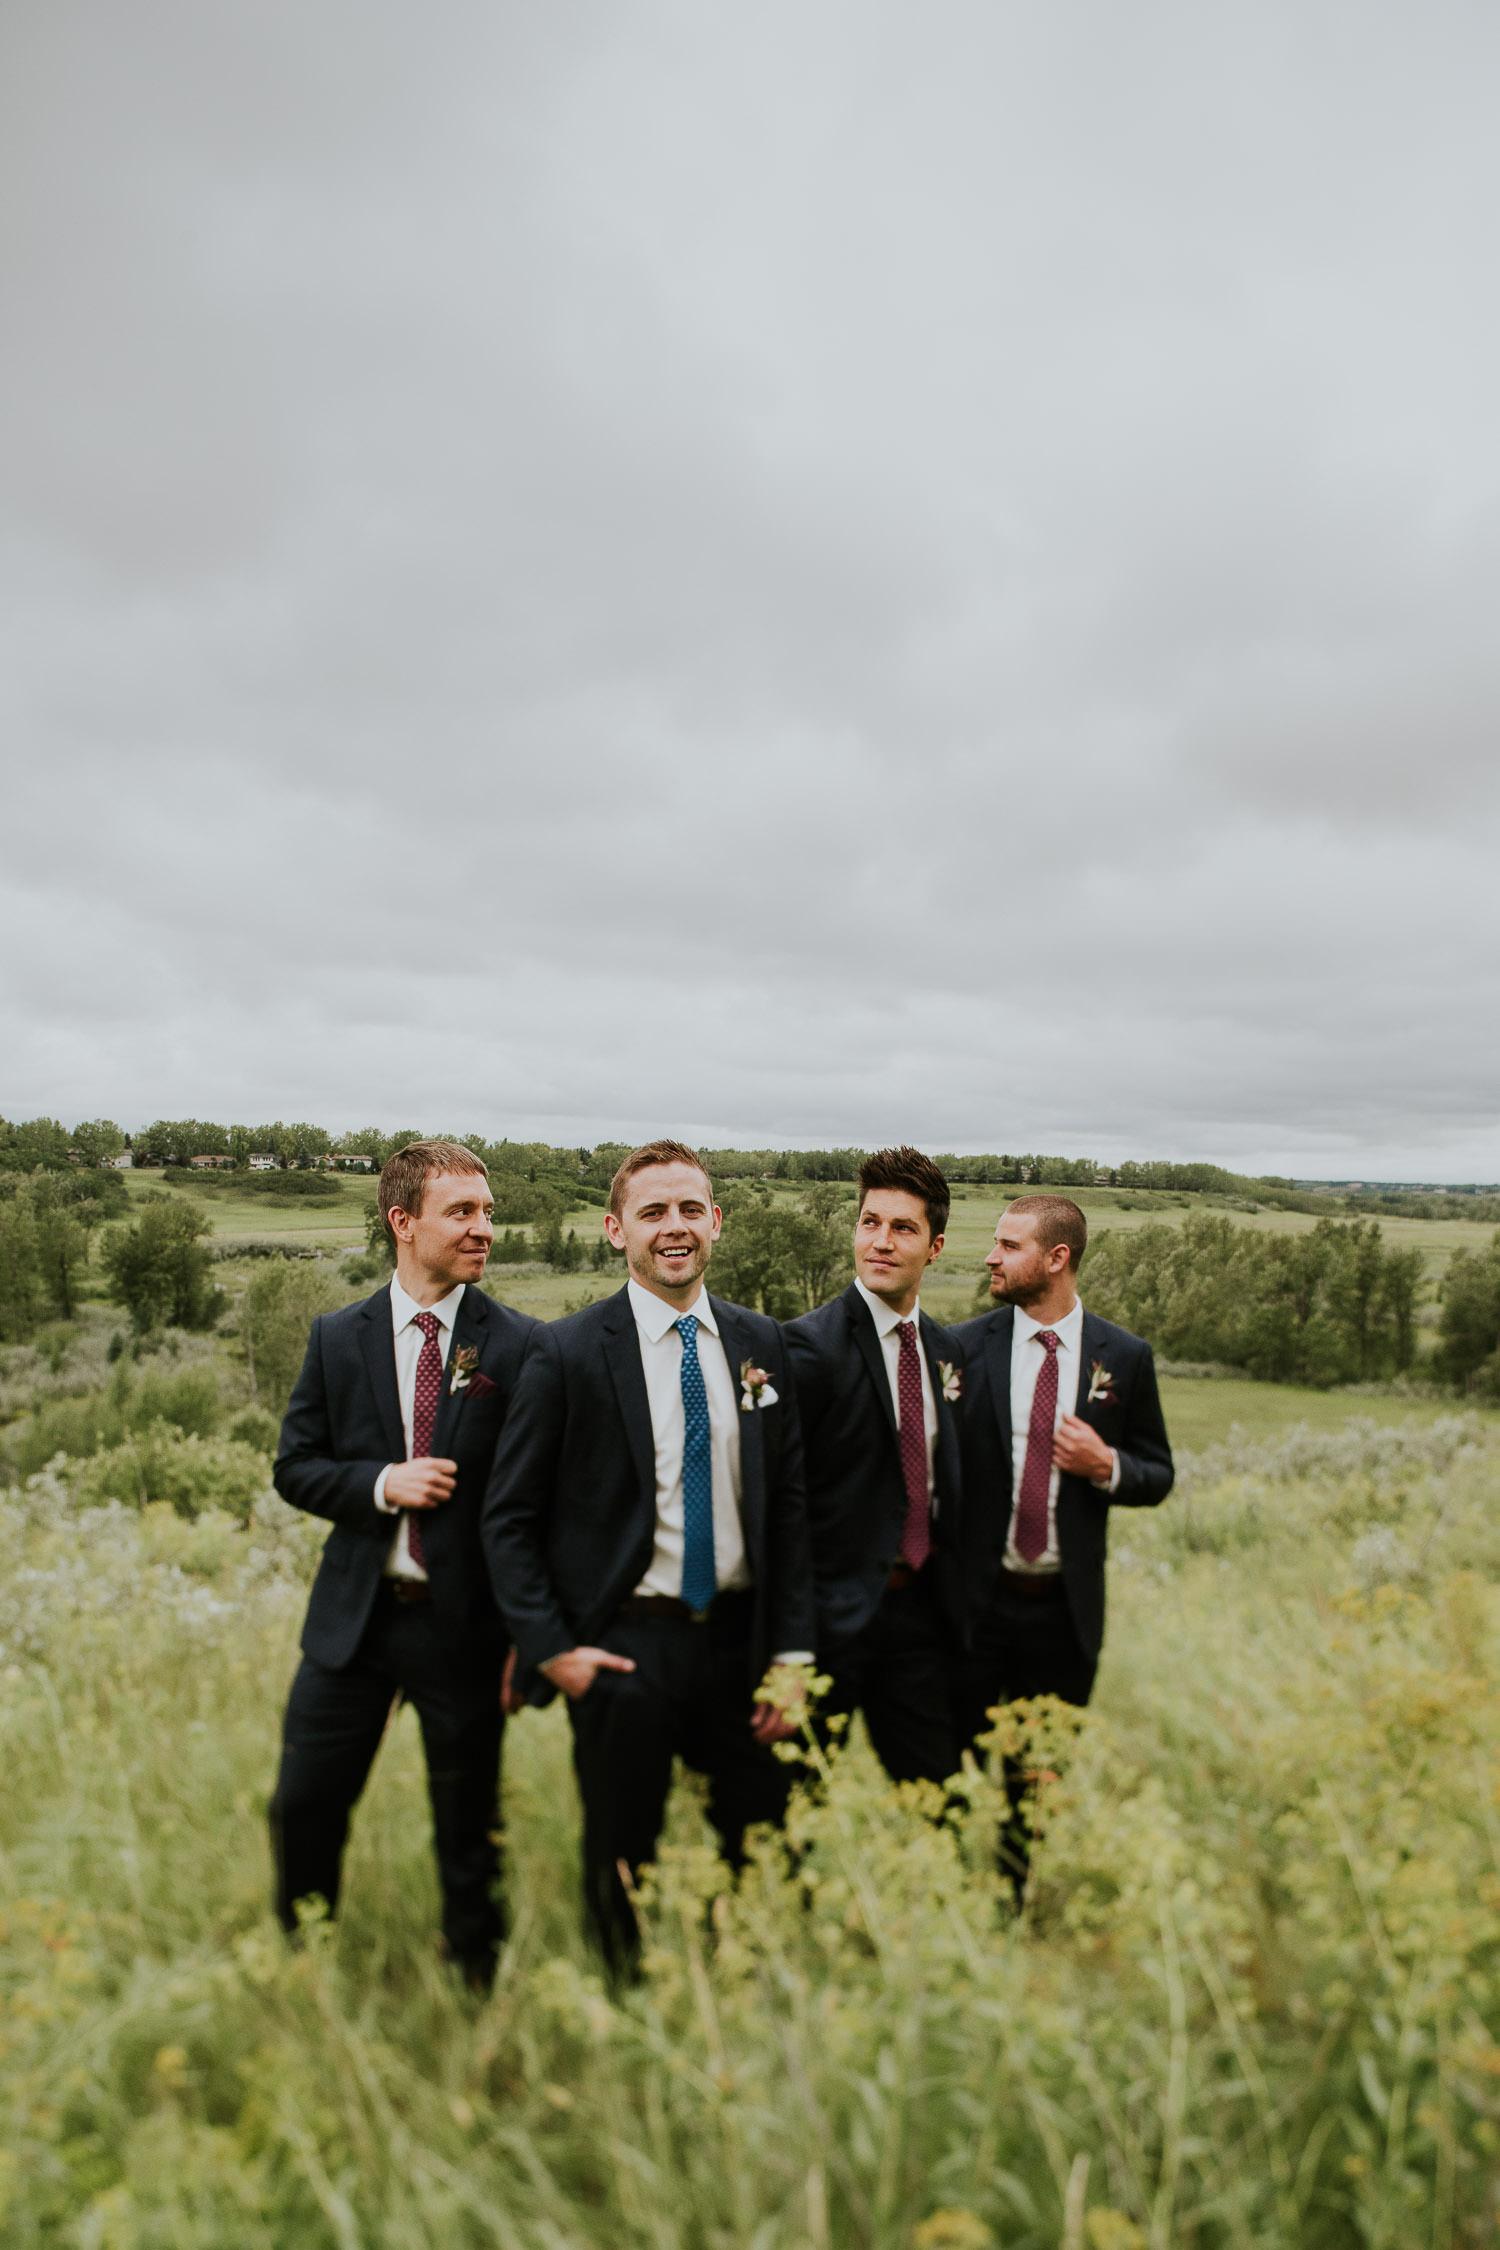 valley-ridge-golf-club-wedding-sarah-pukin-0069